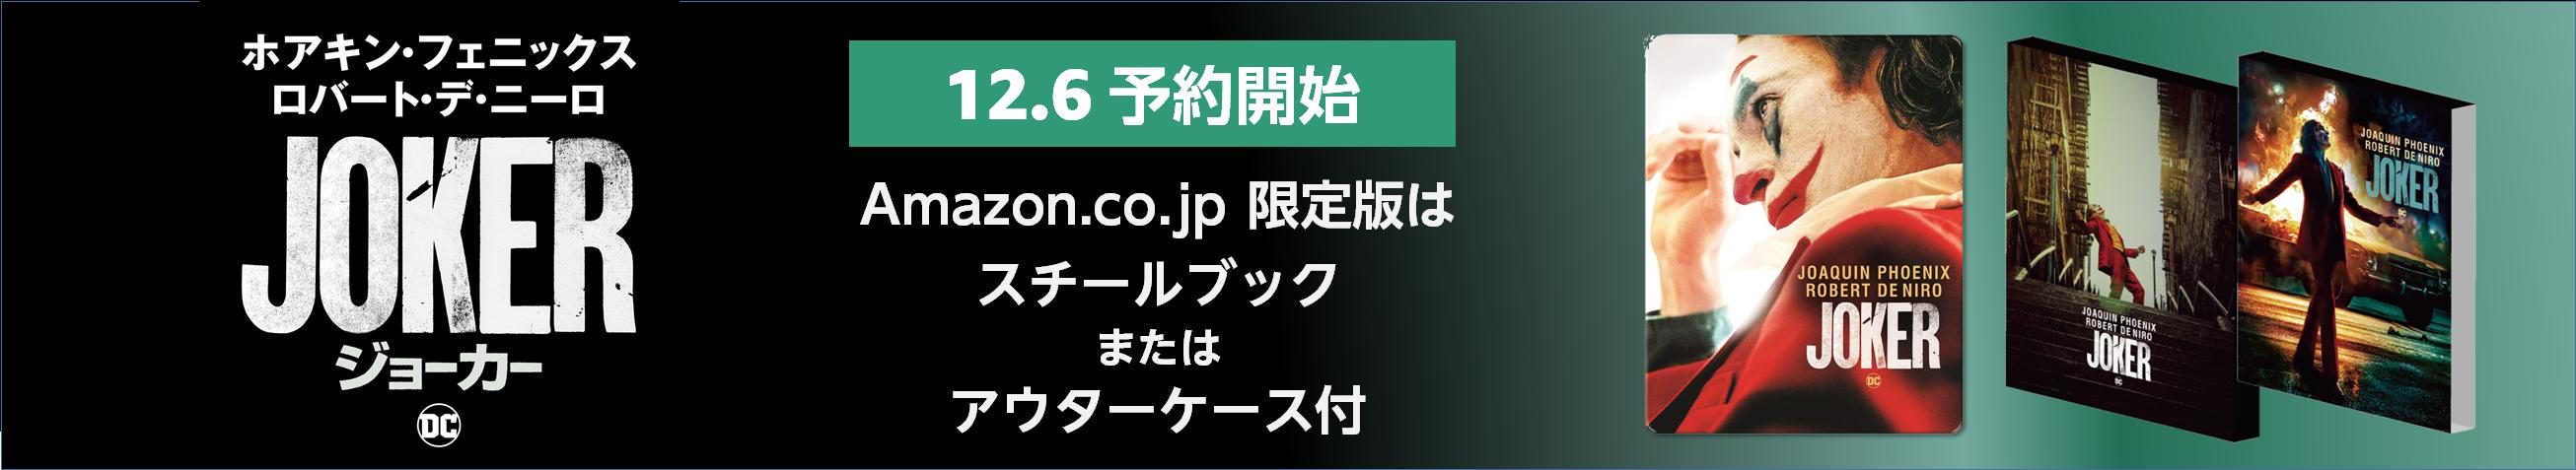 JOKER 12月6日予約開始